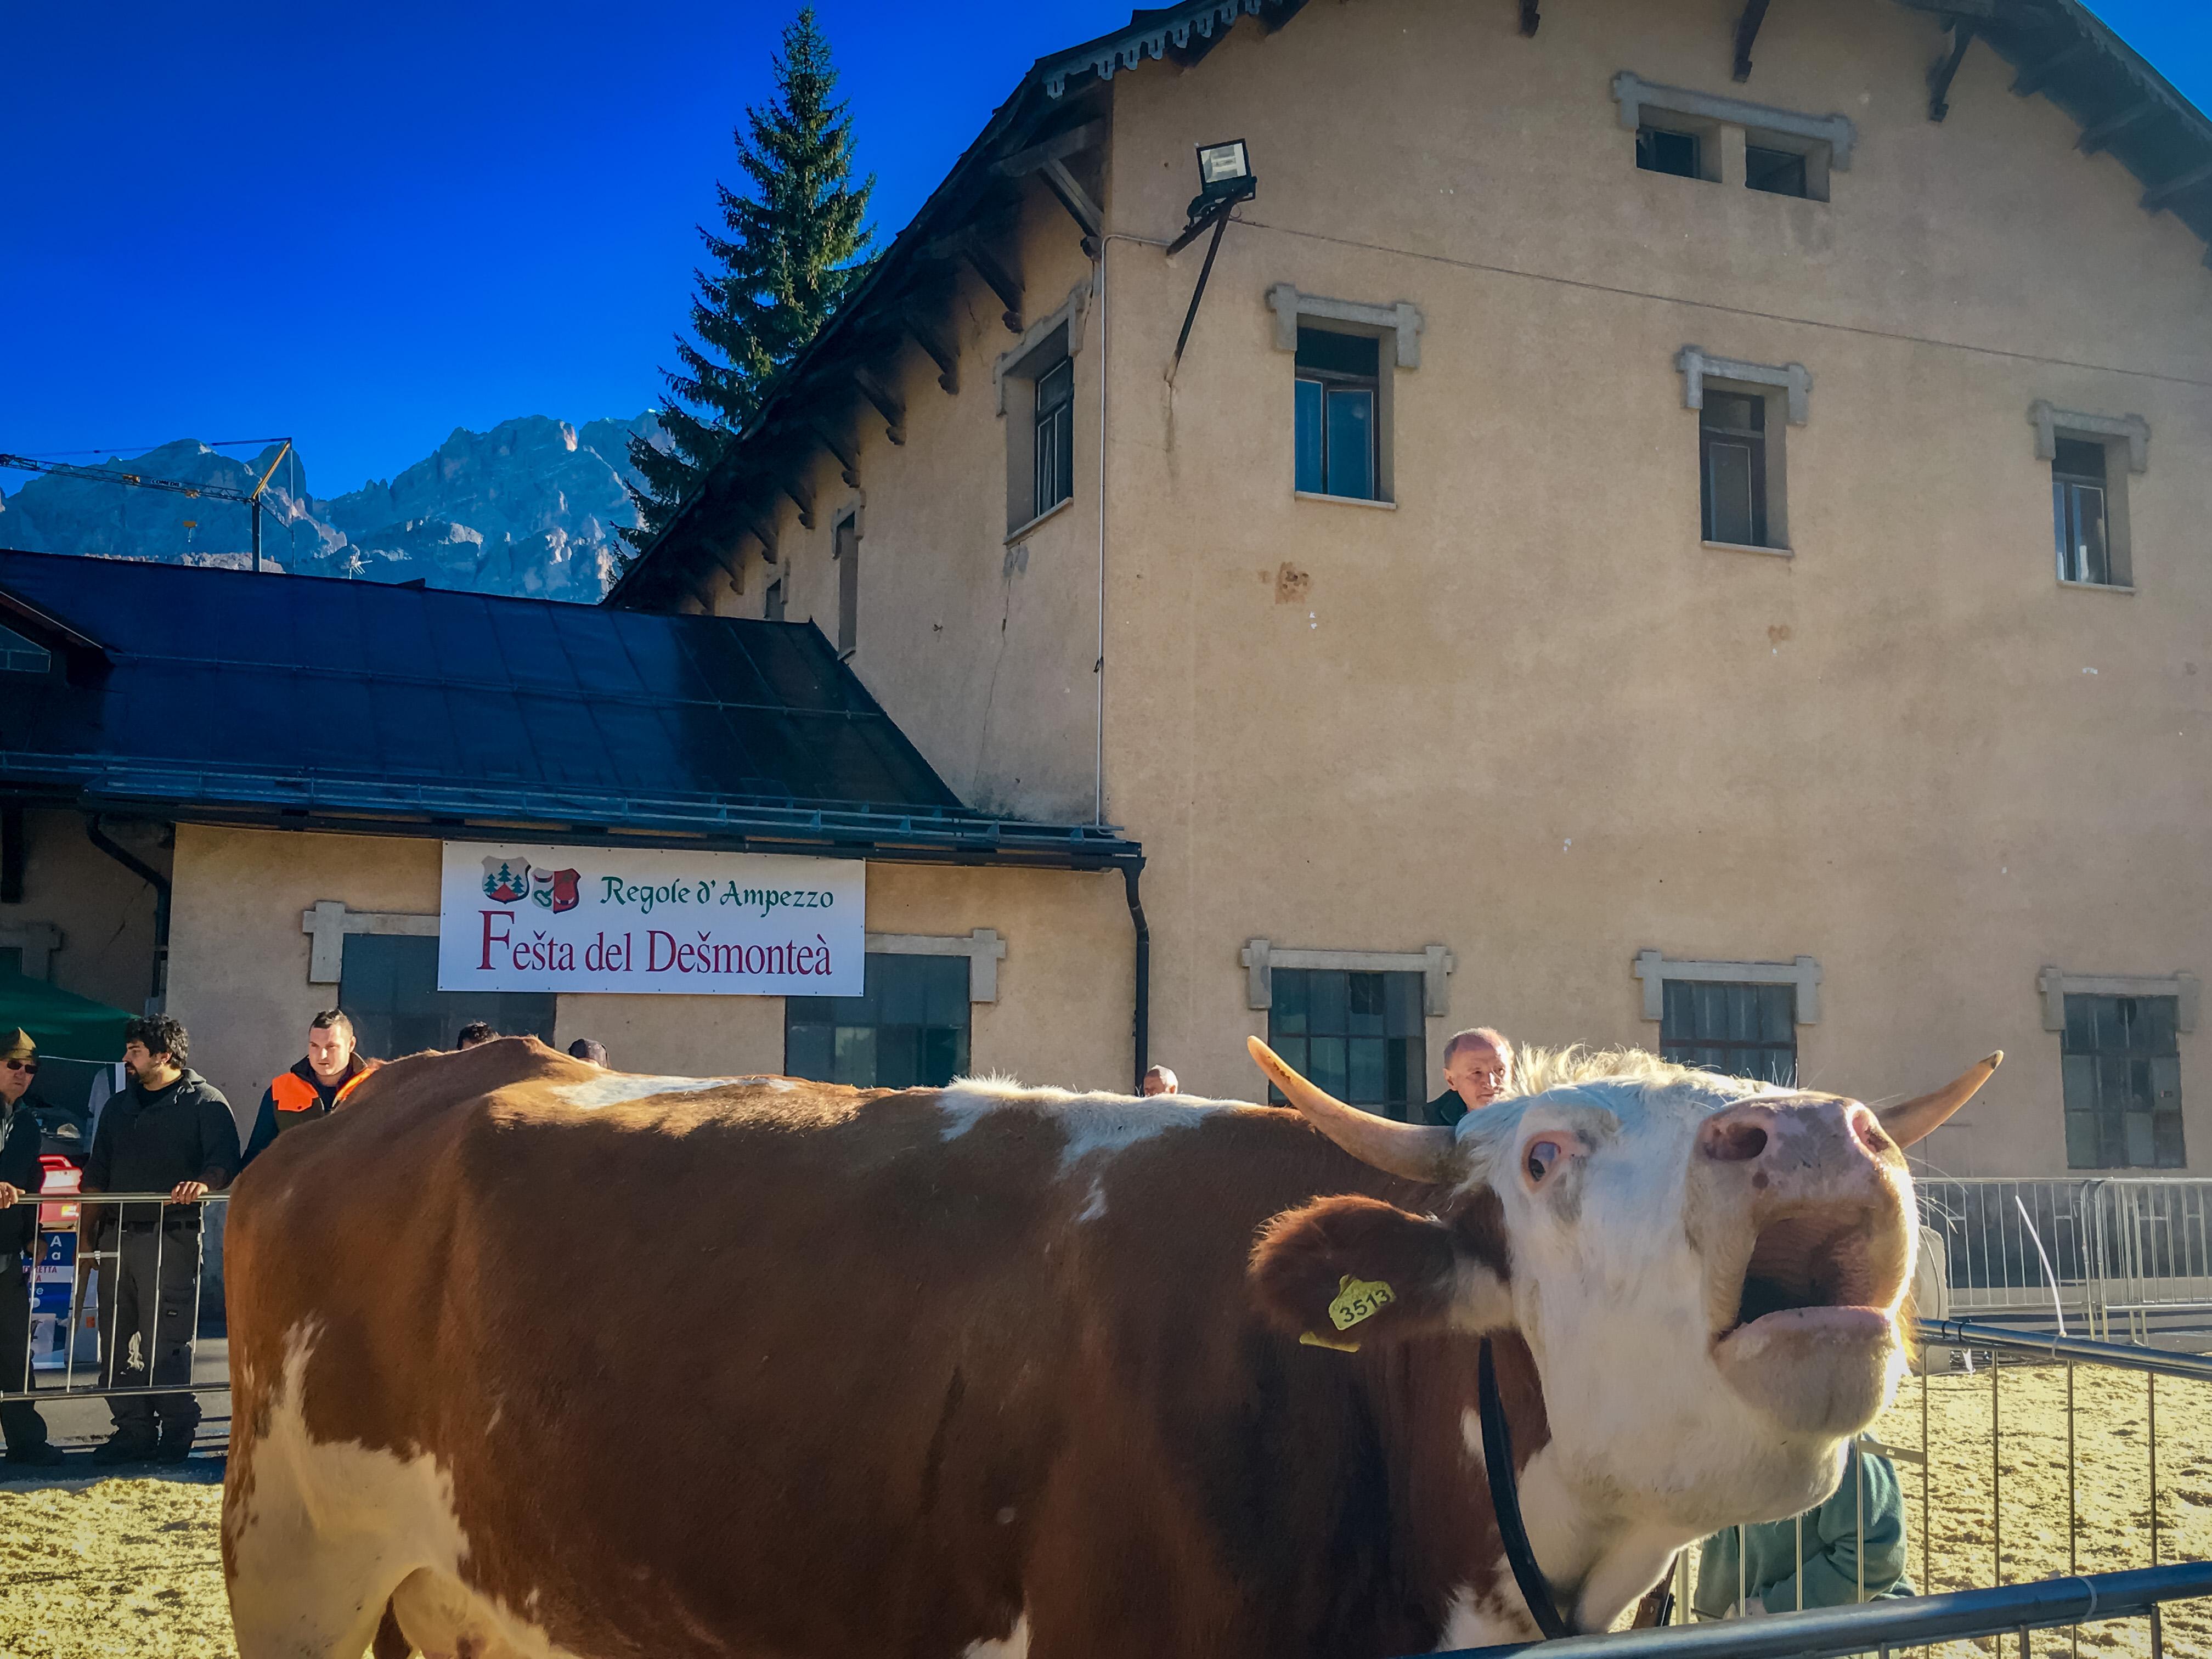 Festa del Desmontea, Agricultural Festival in Cortina d'Ampezzo in October